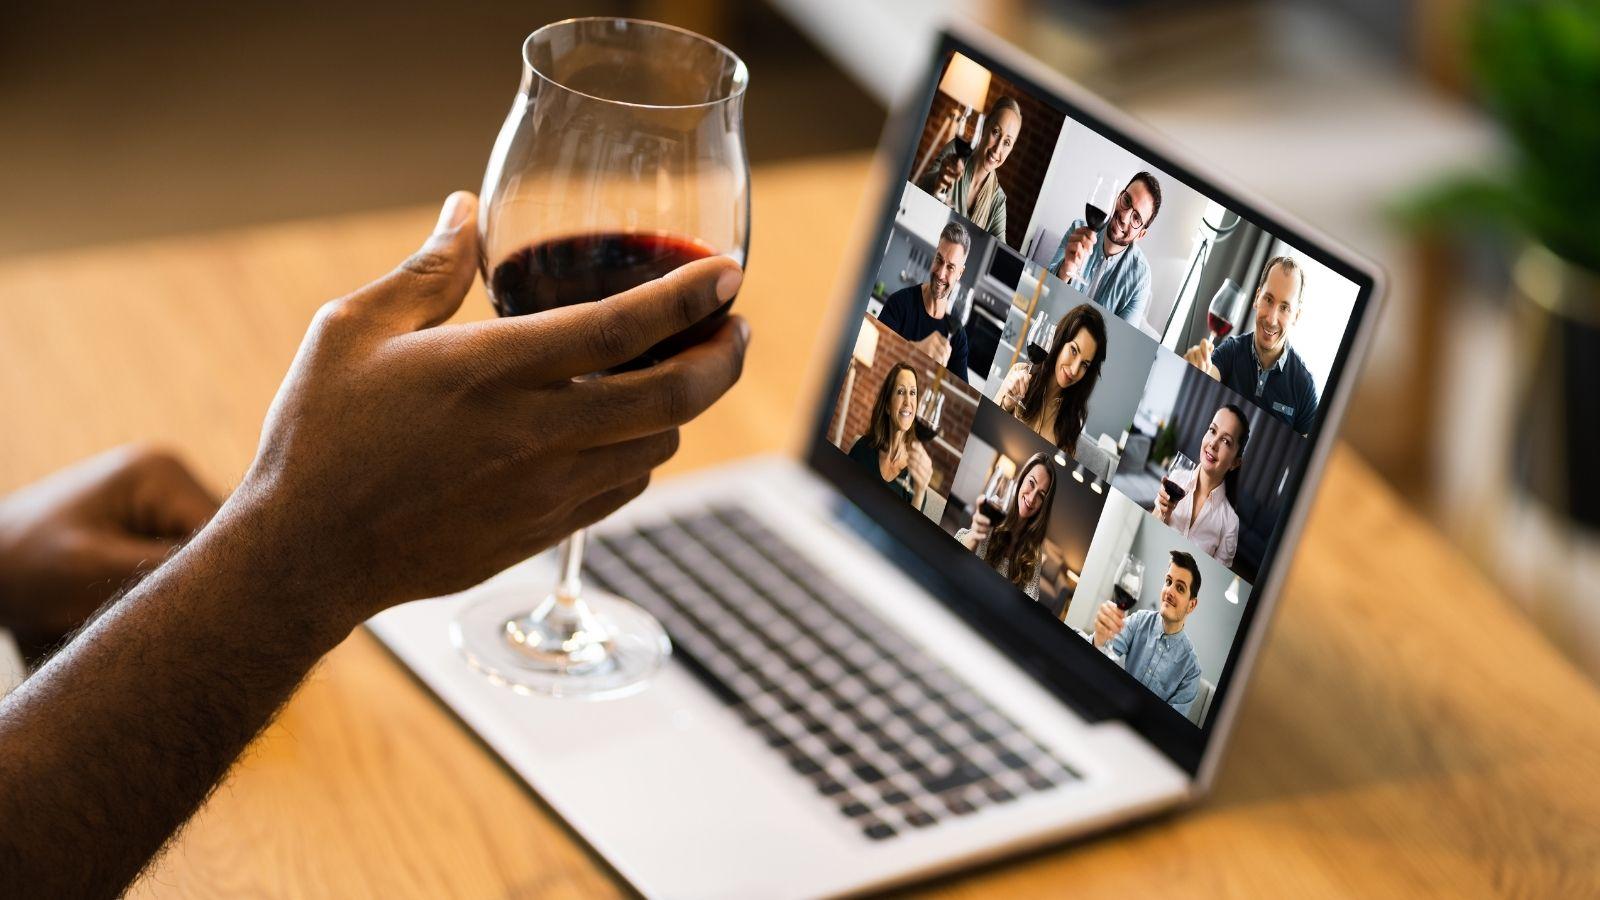 Rencontres vinicoles via le Web